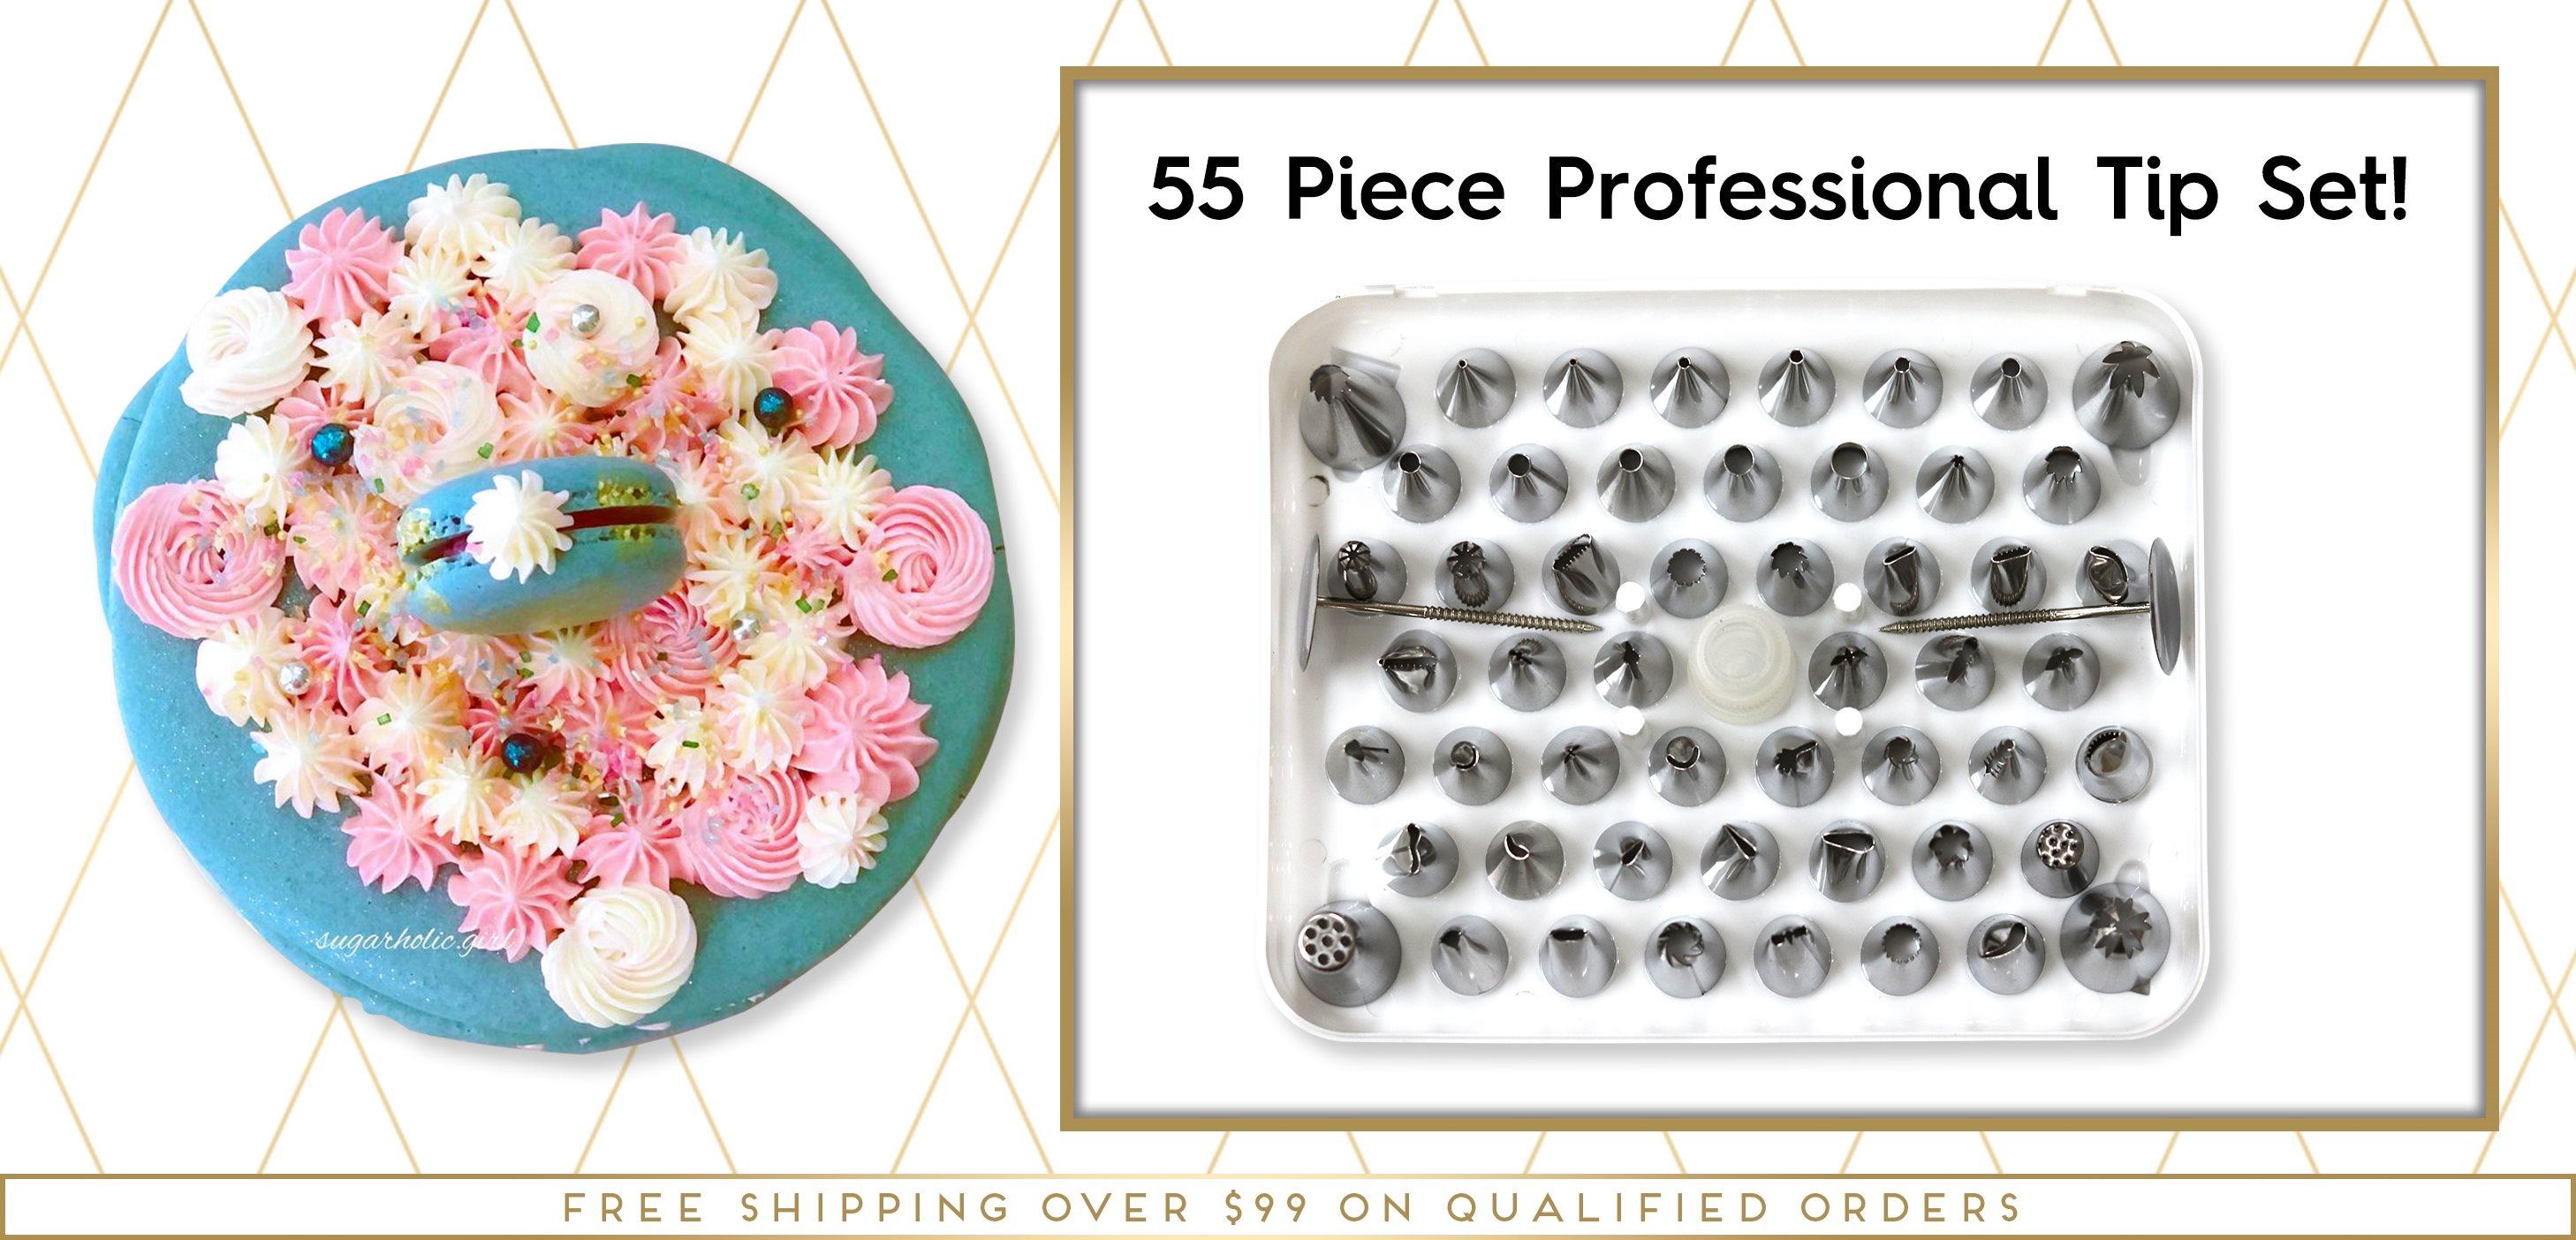 Tip Set 55 Piece